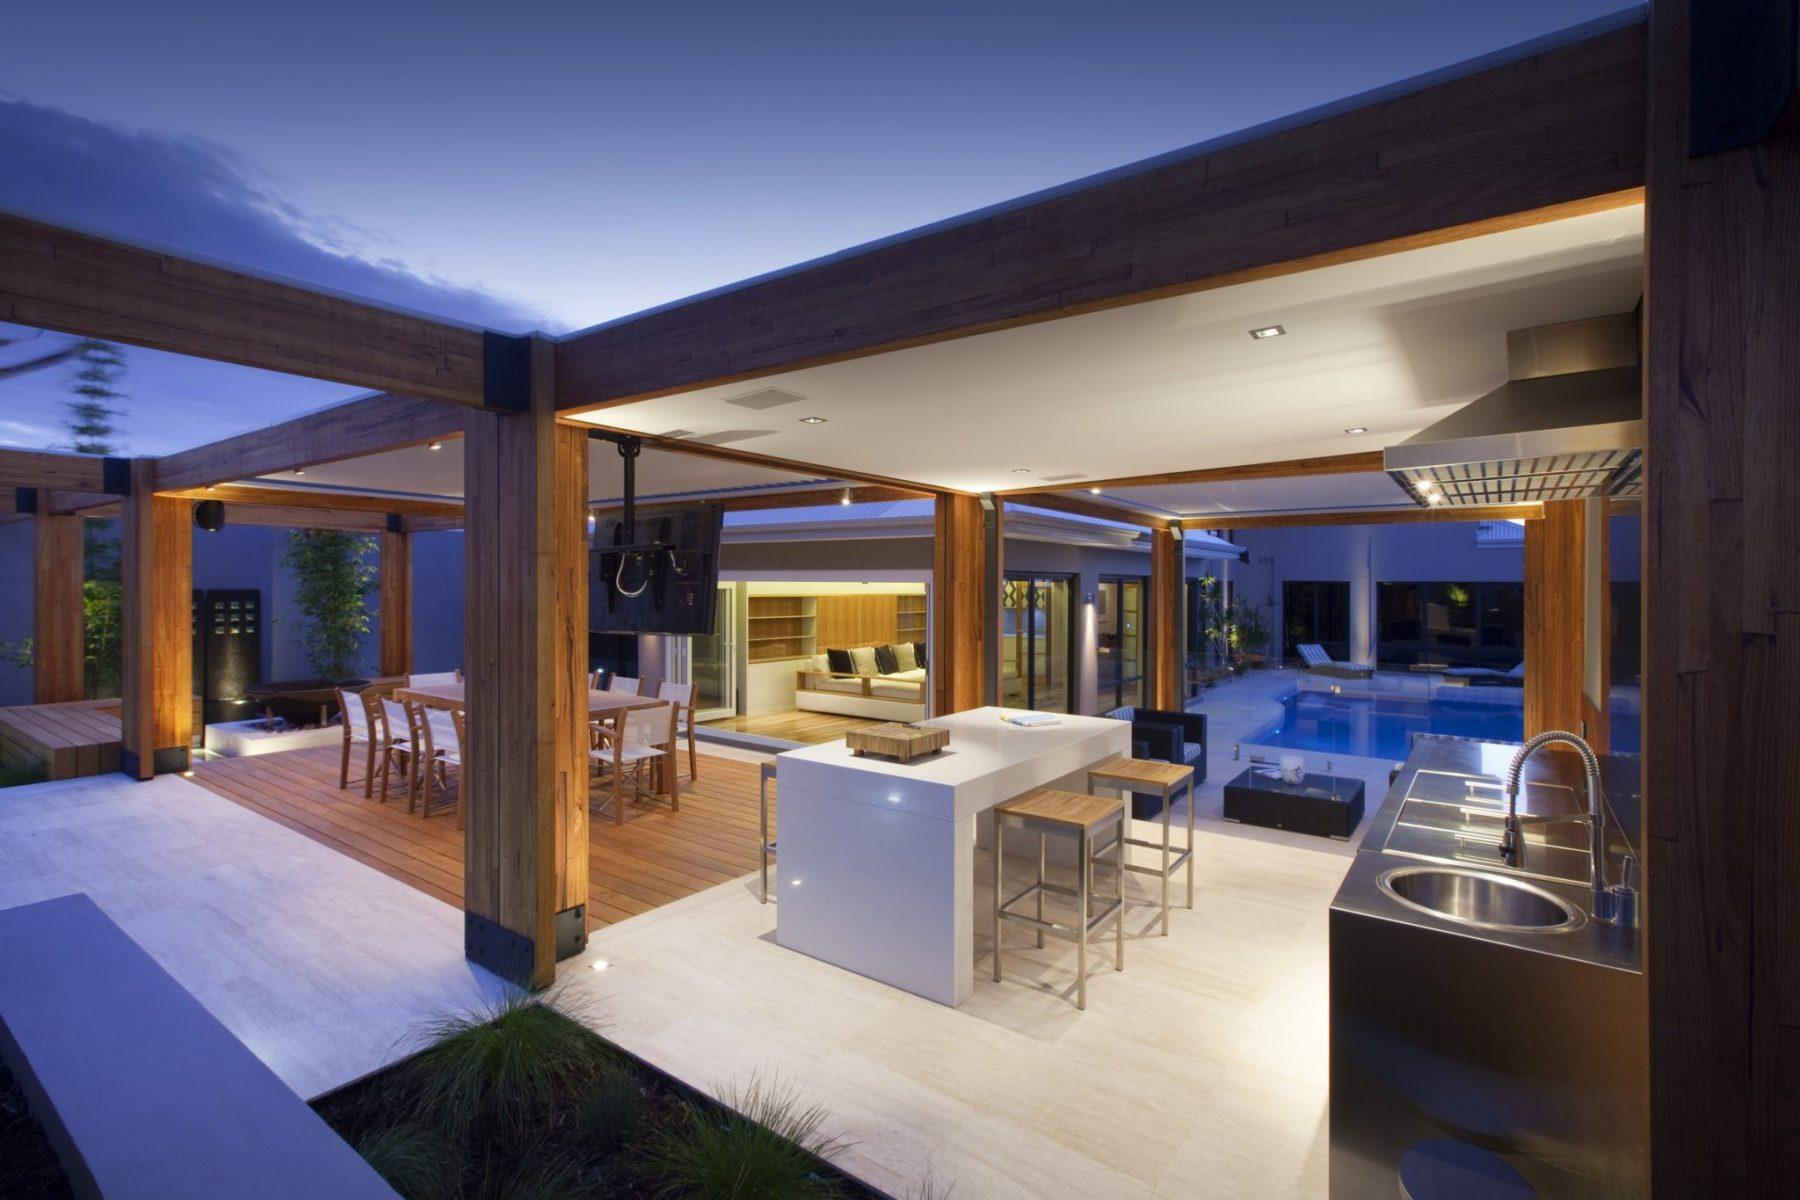 Perth property landscape design by Ritz Exterior Design